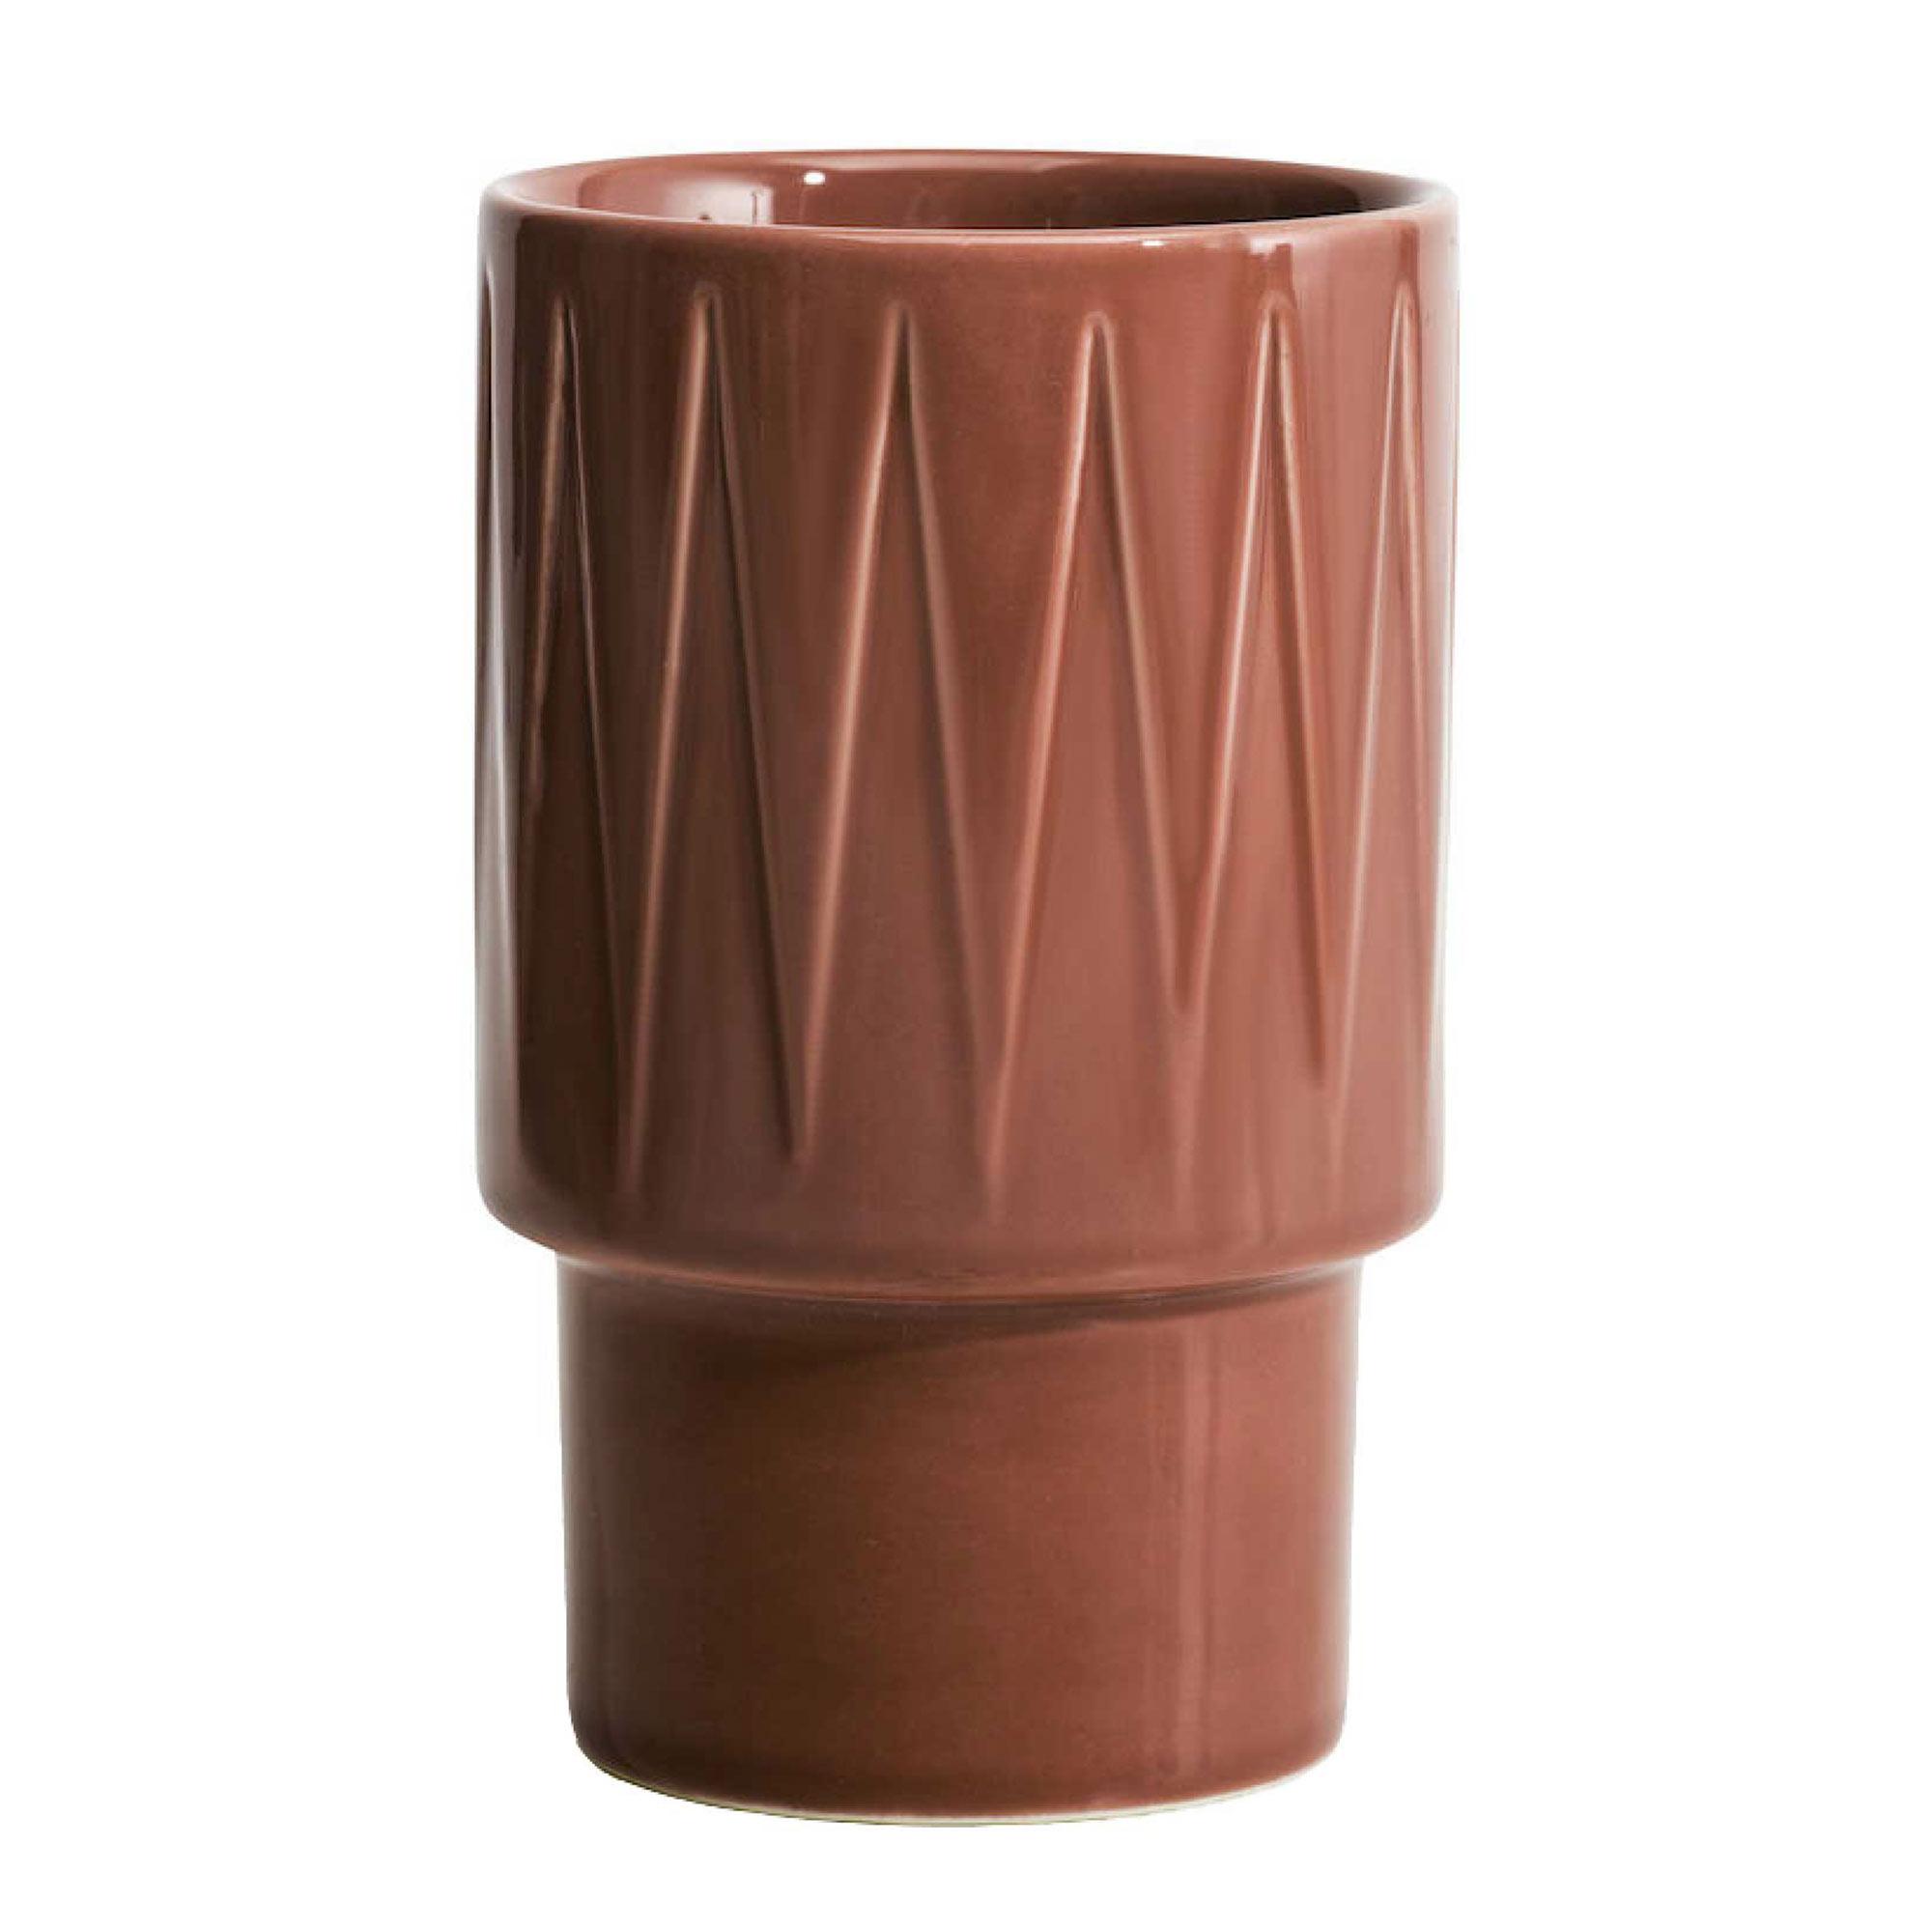 Кружка латте Sagaform Coffee & More коричневая 400 мл